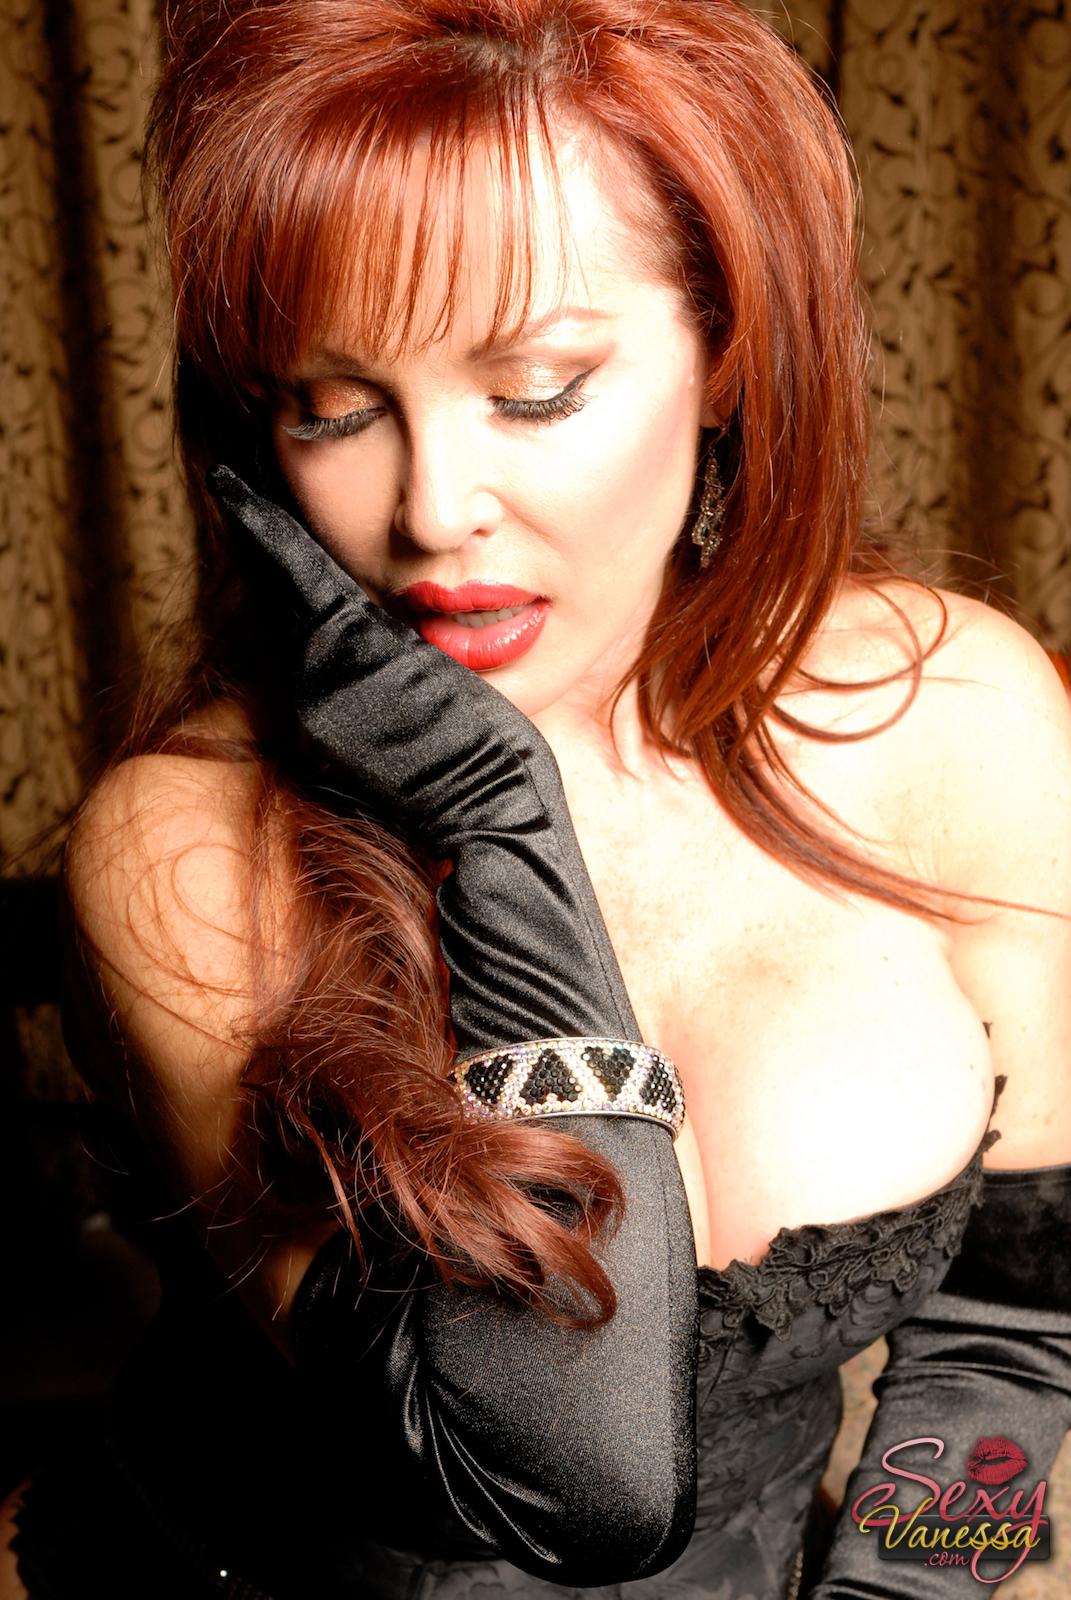 Ama Gloves Porno Xxx sexy vanessa in black gloves well hello boys, like my gloves